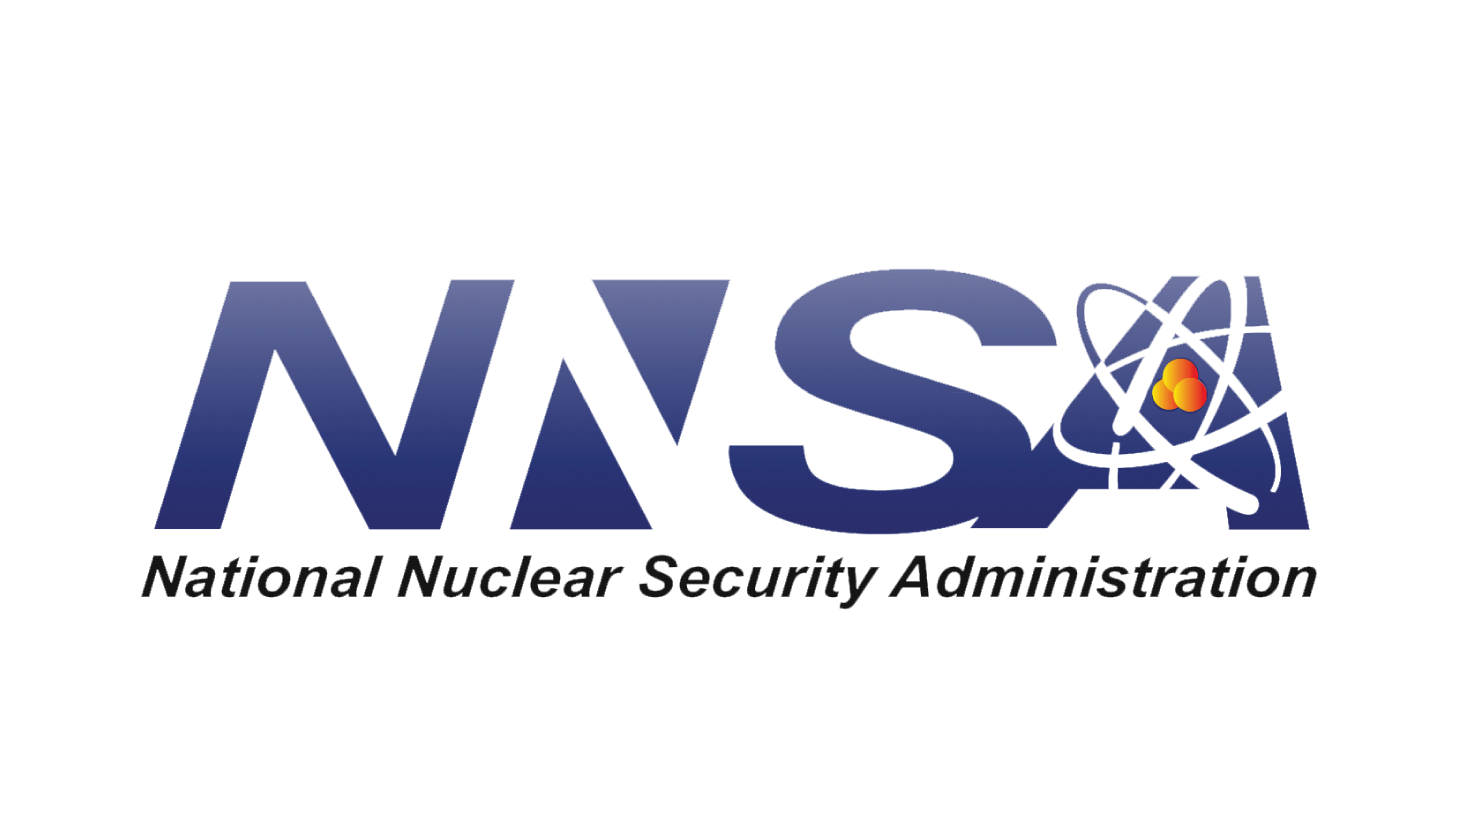 DevonWay-Logos-Scroller-NNSA